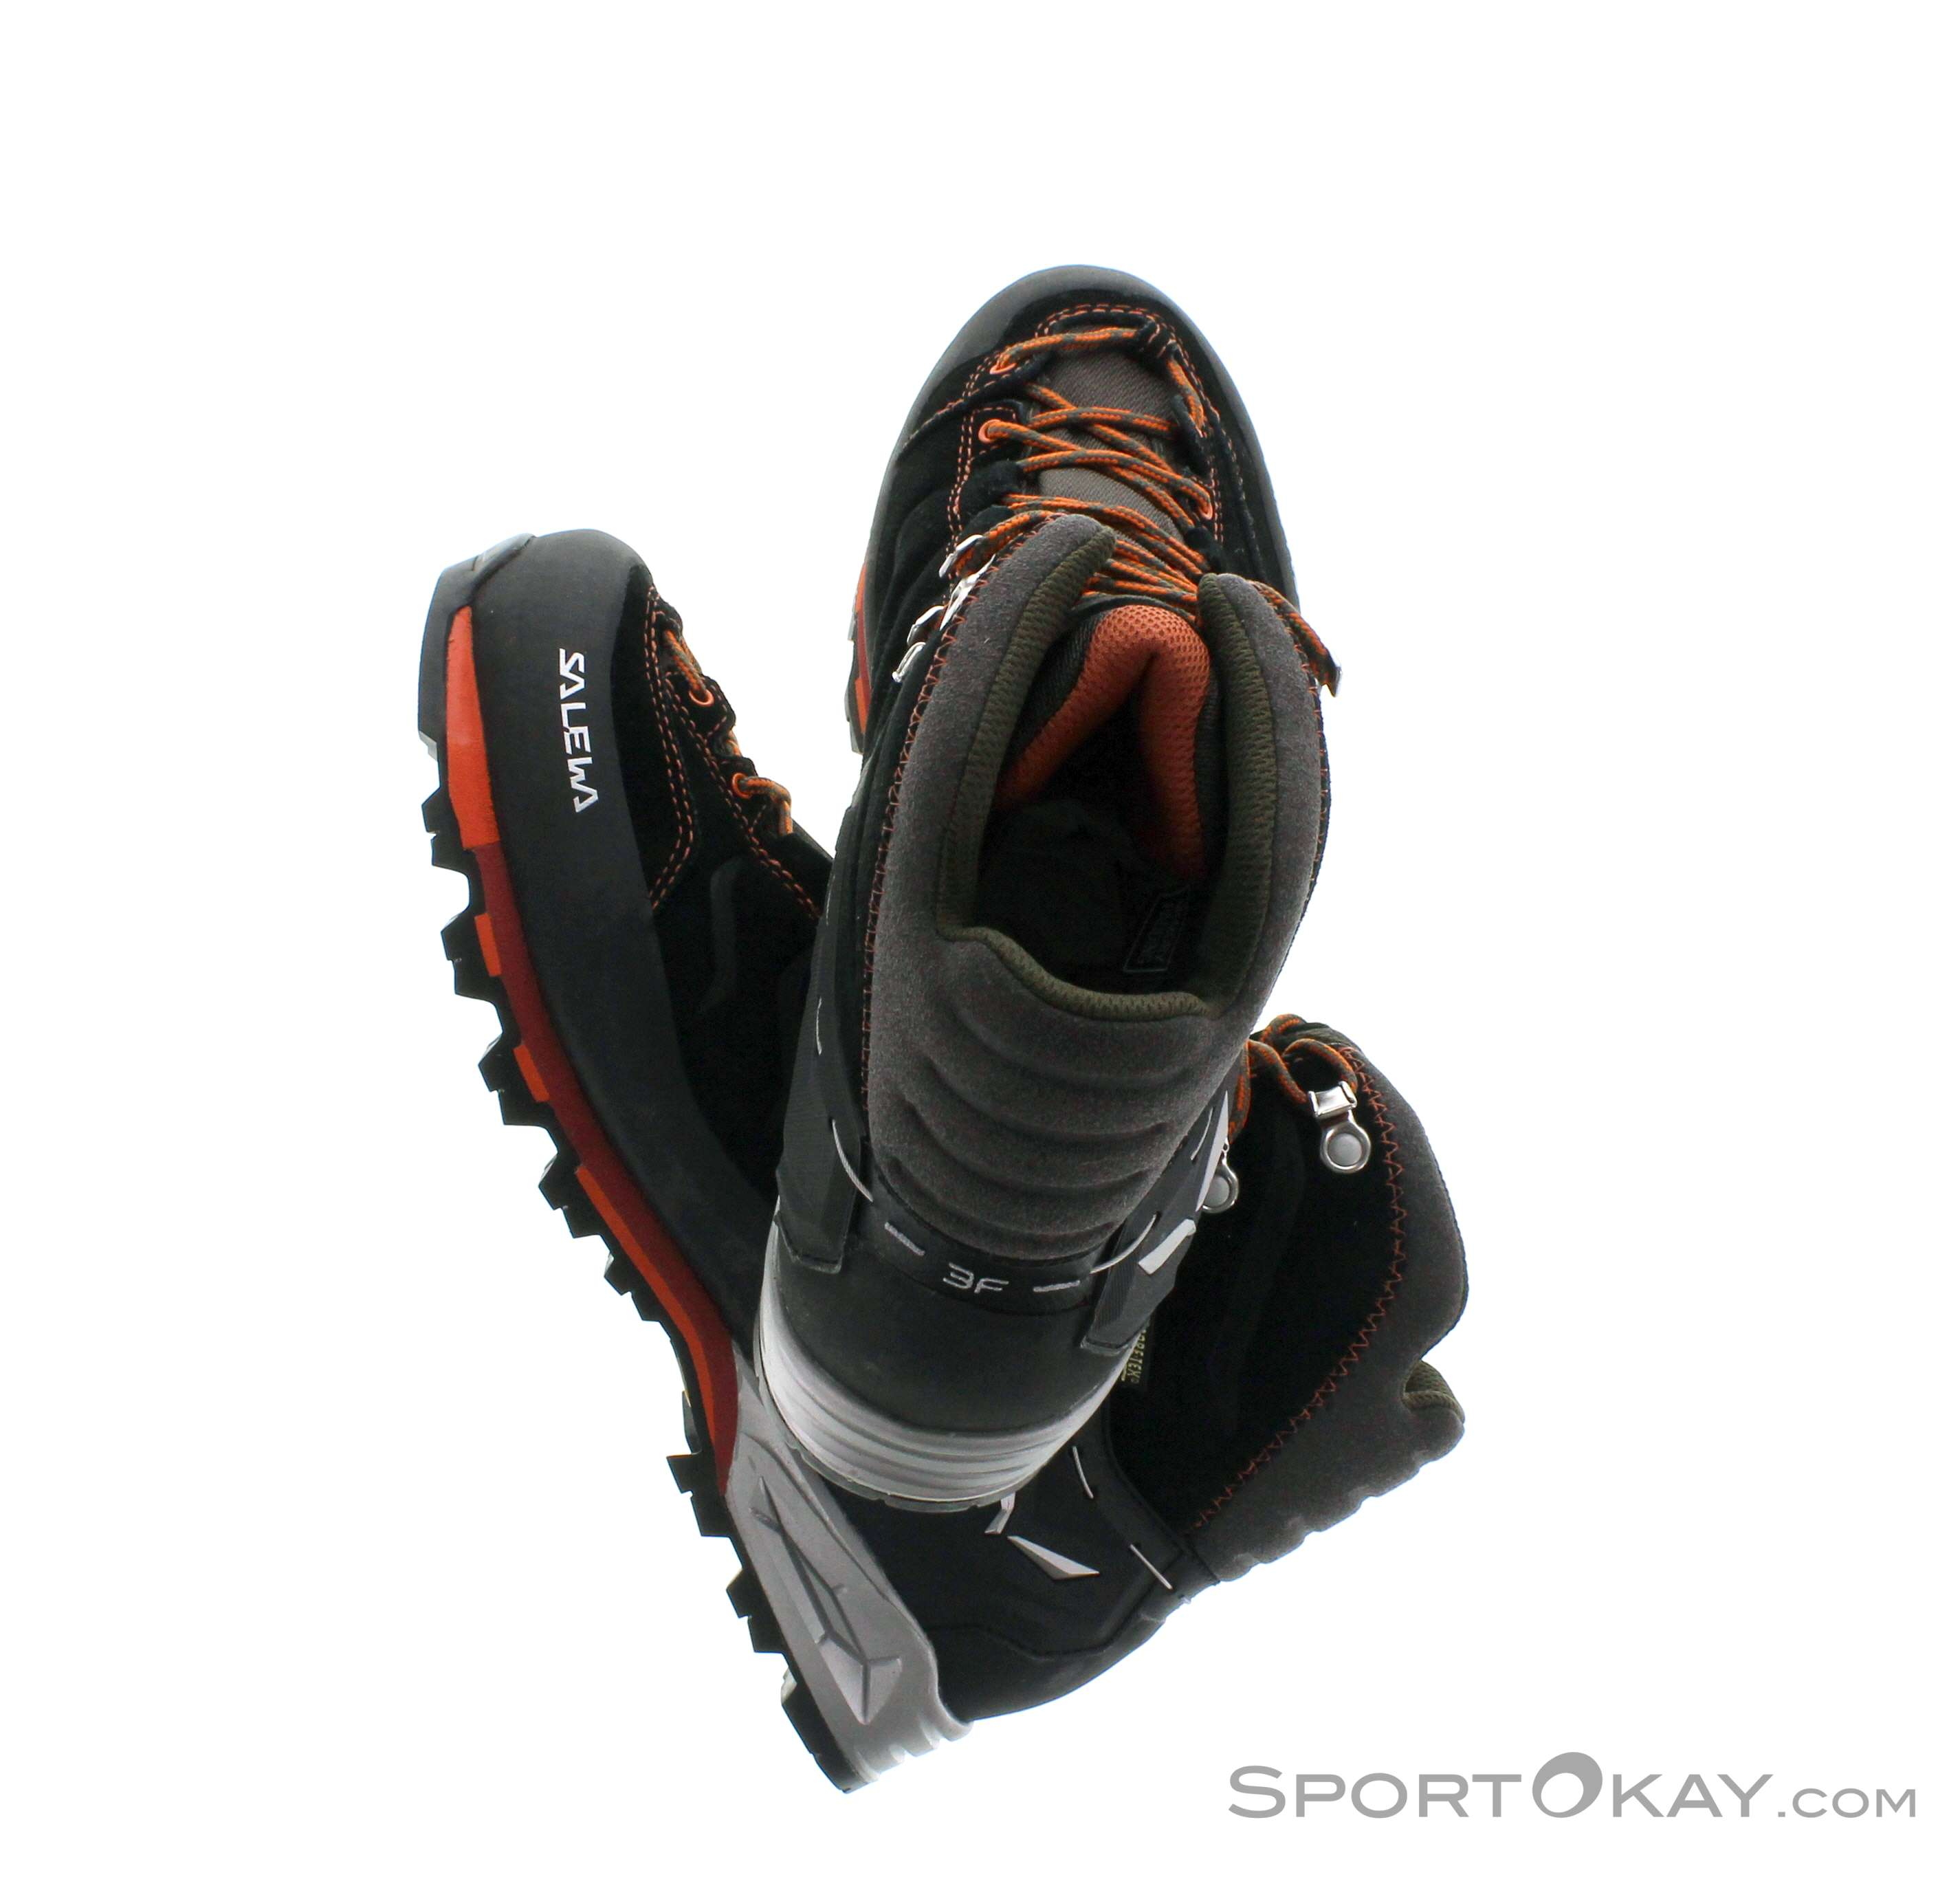 hanwag trekkingschuhe damen schmale füße 42 5